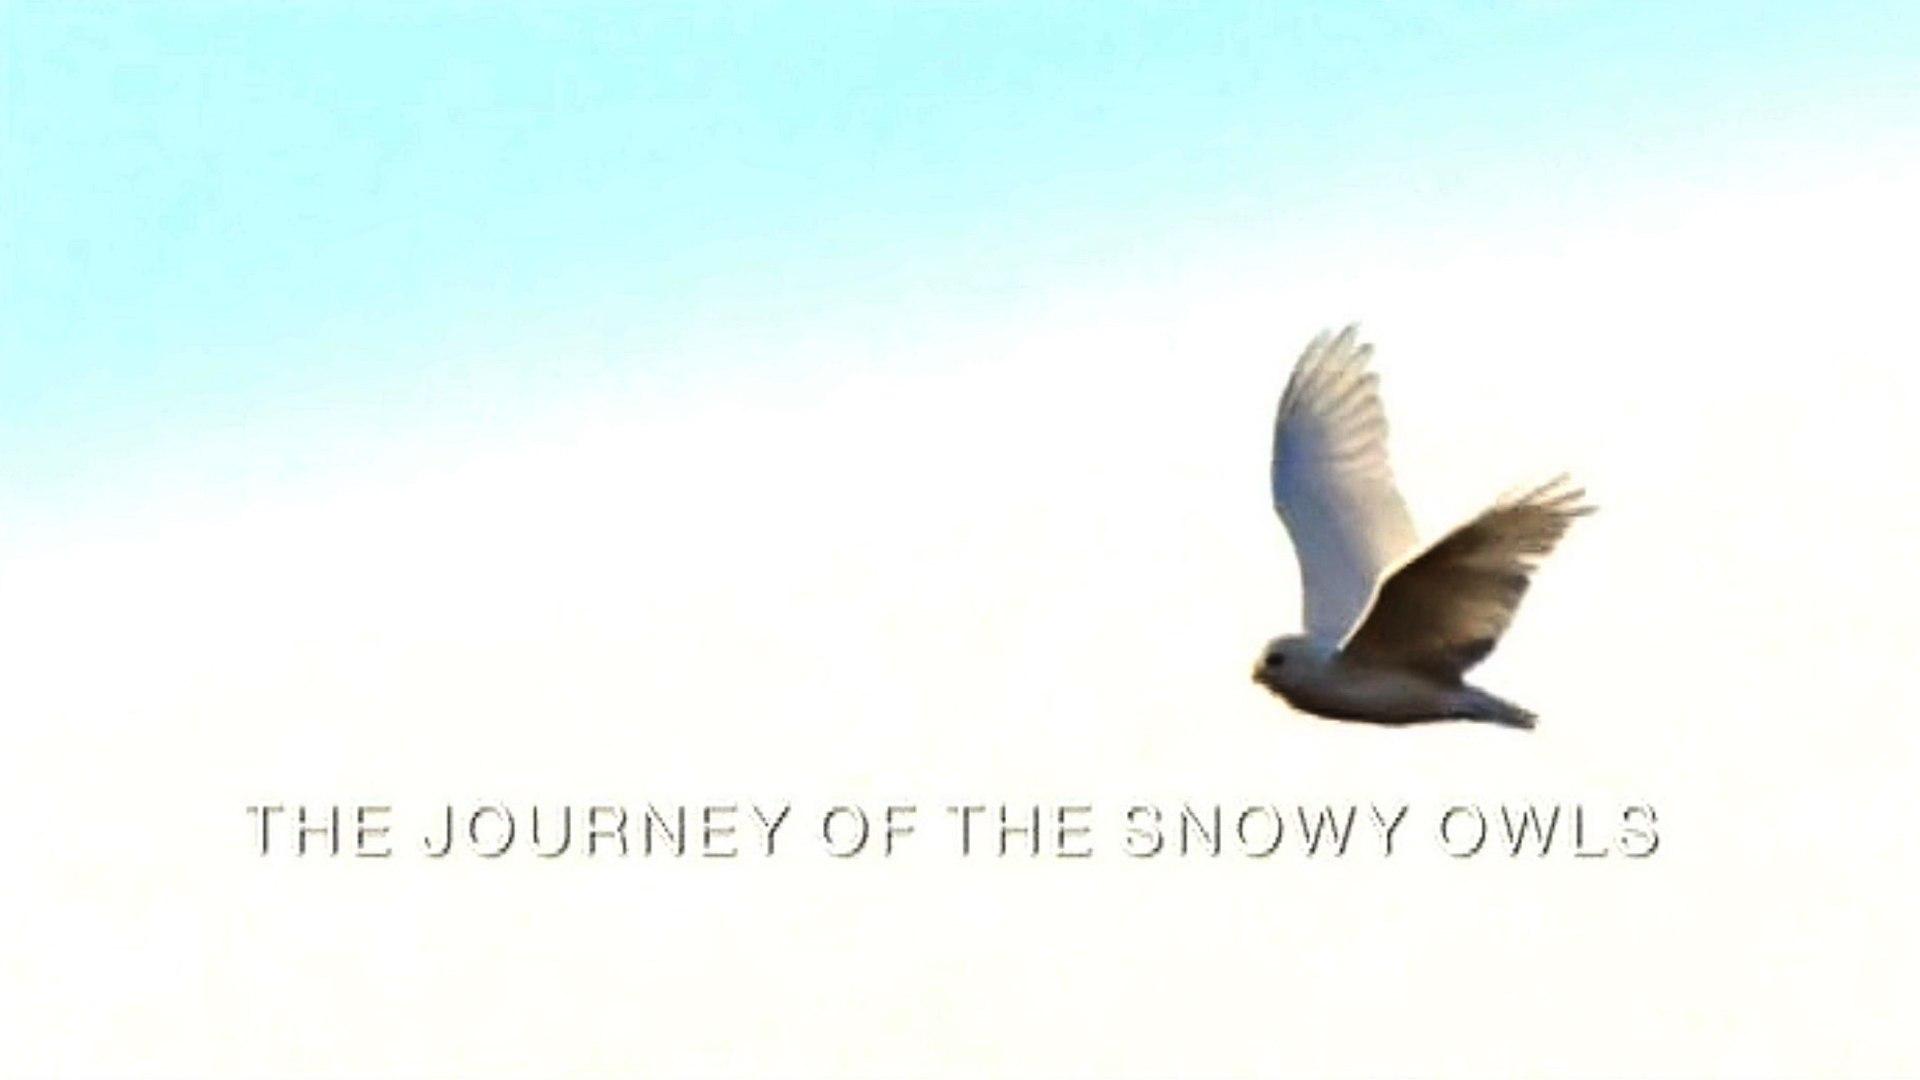 Зимняя сказка. Путешествие полярных сов / A winter's Tale: The Journey of the Snowy Owls, (2015)